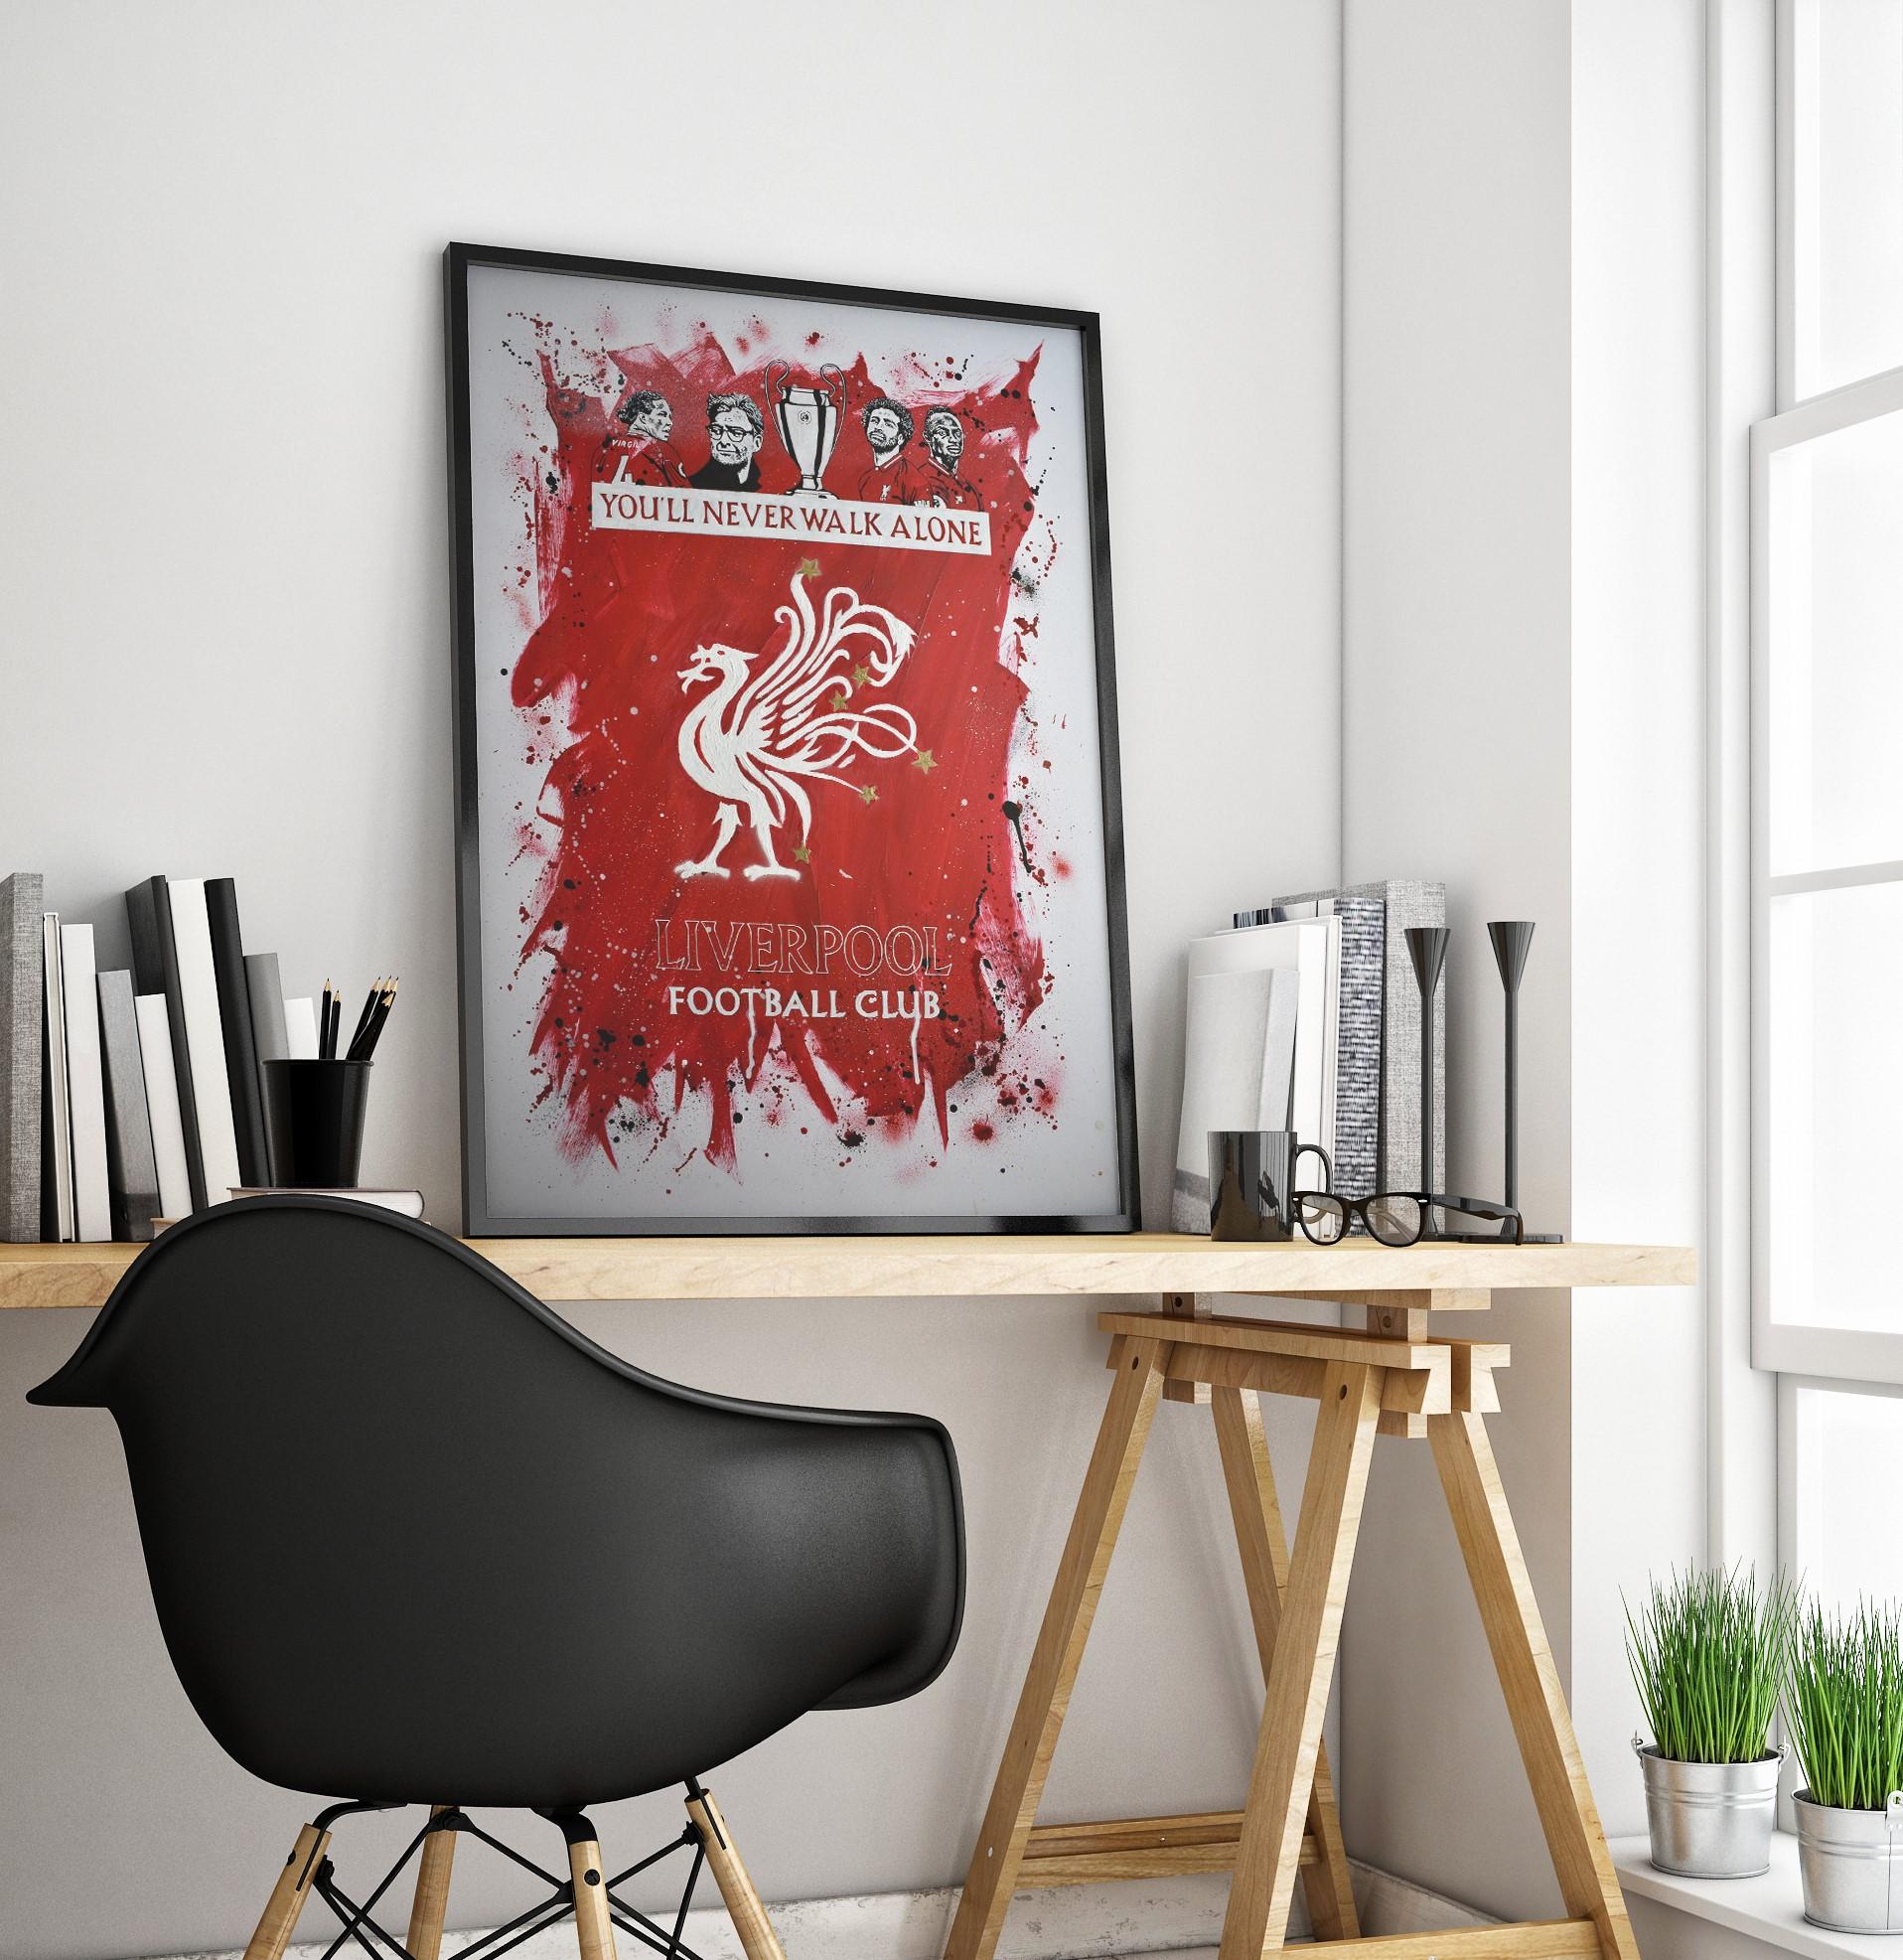 Liverpool FC - Champions League Winners - Ian Salmon Art - Painting - FRAMED - Mockup 5.jpg